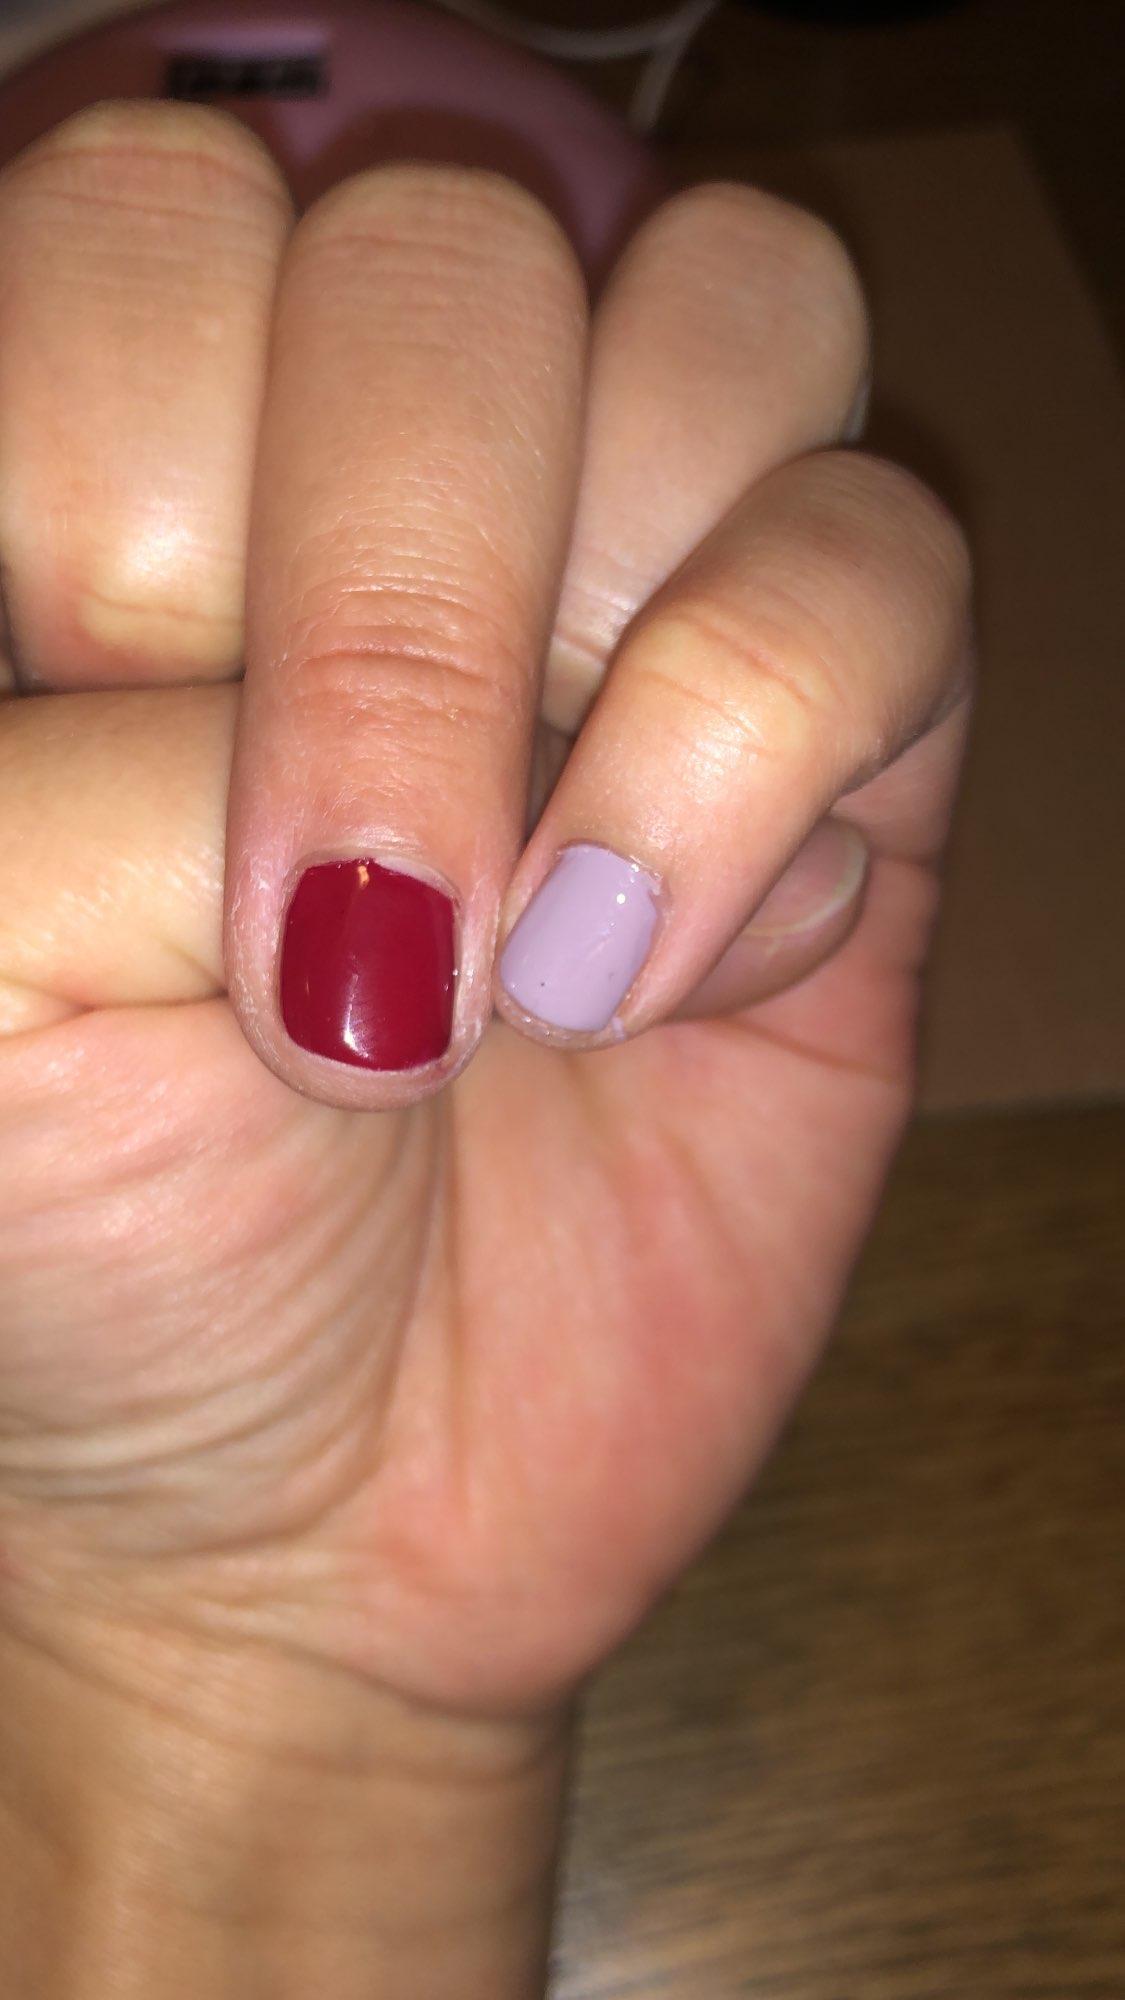 Gel Nail Polish Set For Manicure Set nail art UV LED lamp Manicure photo review